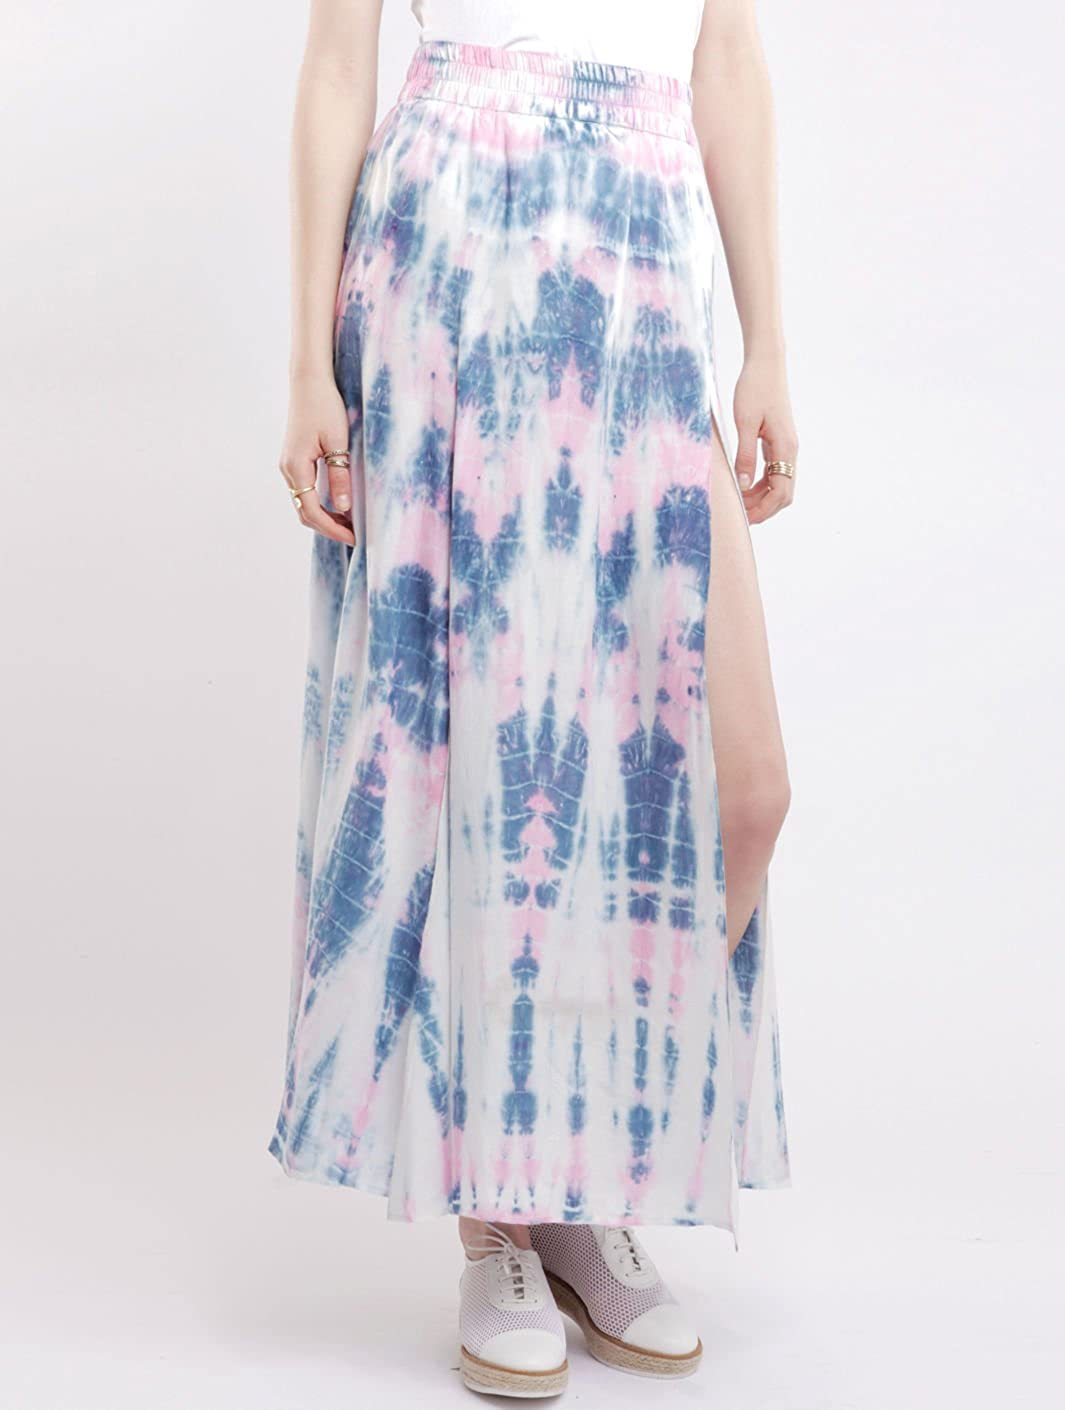 Falda larga Kwando S. Tie-Dye Somedays Lovin S Mujer: Amazon.es ...